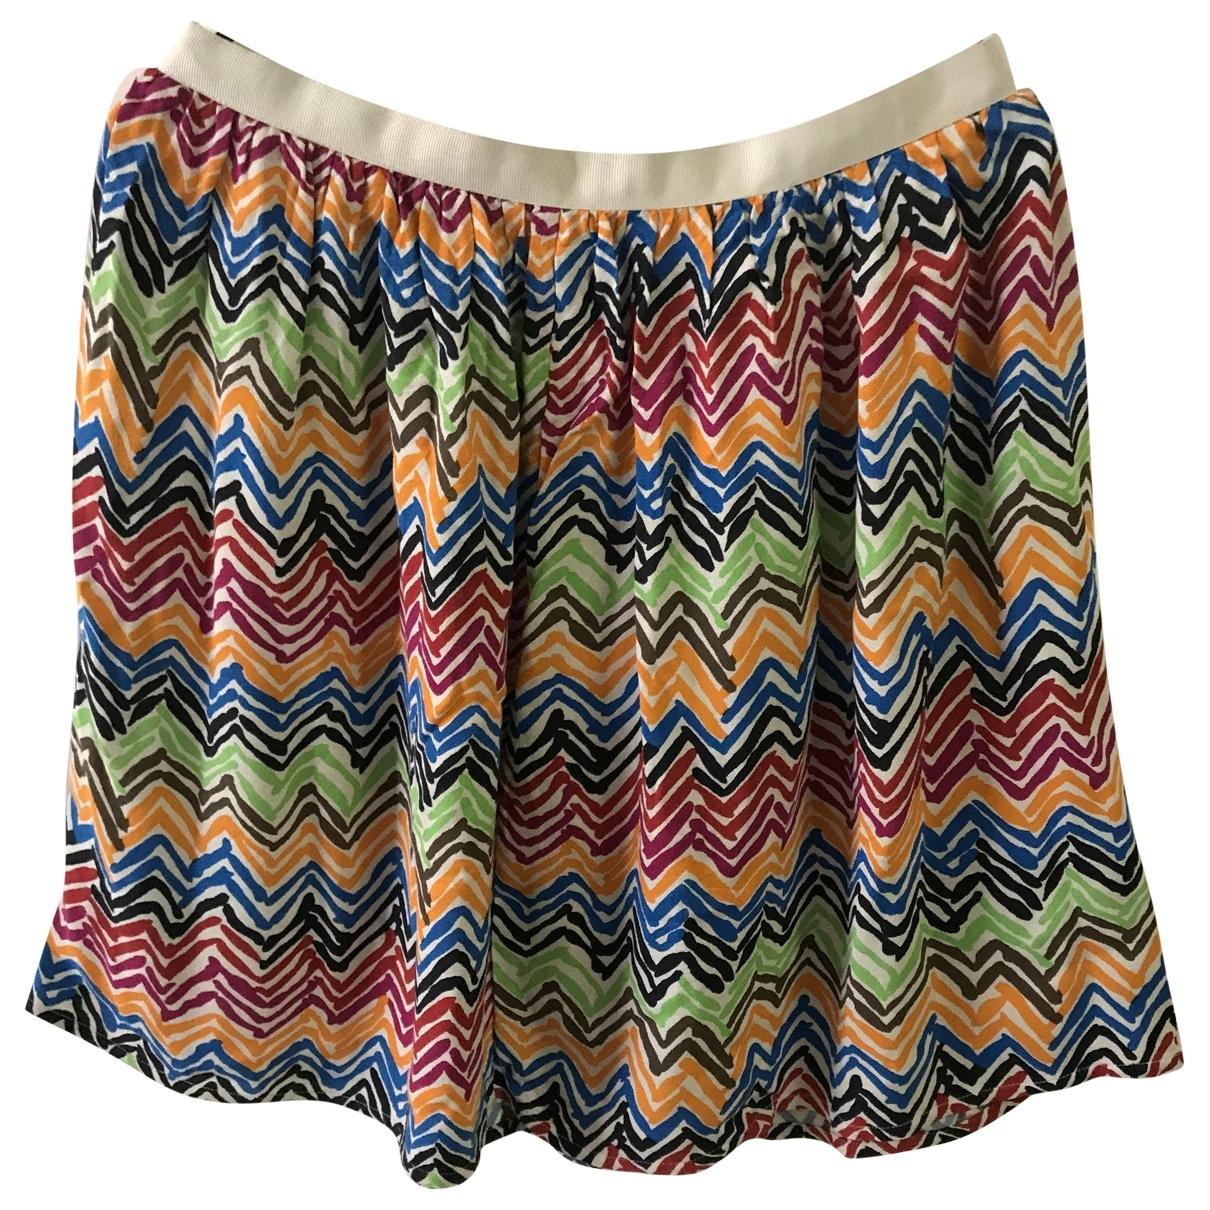 American Vintage \N Cotton skirt for Women L International